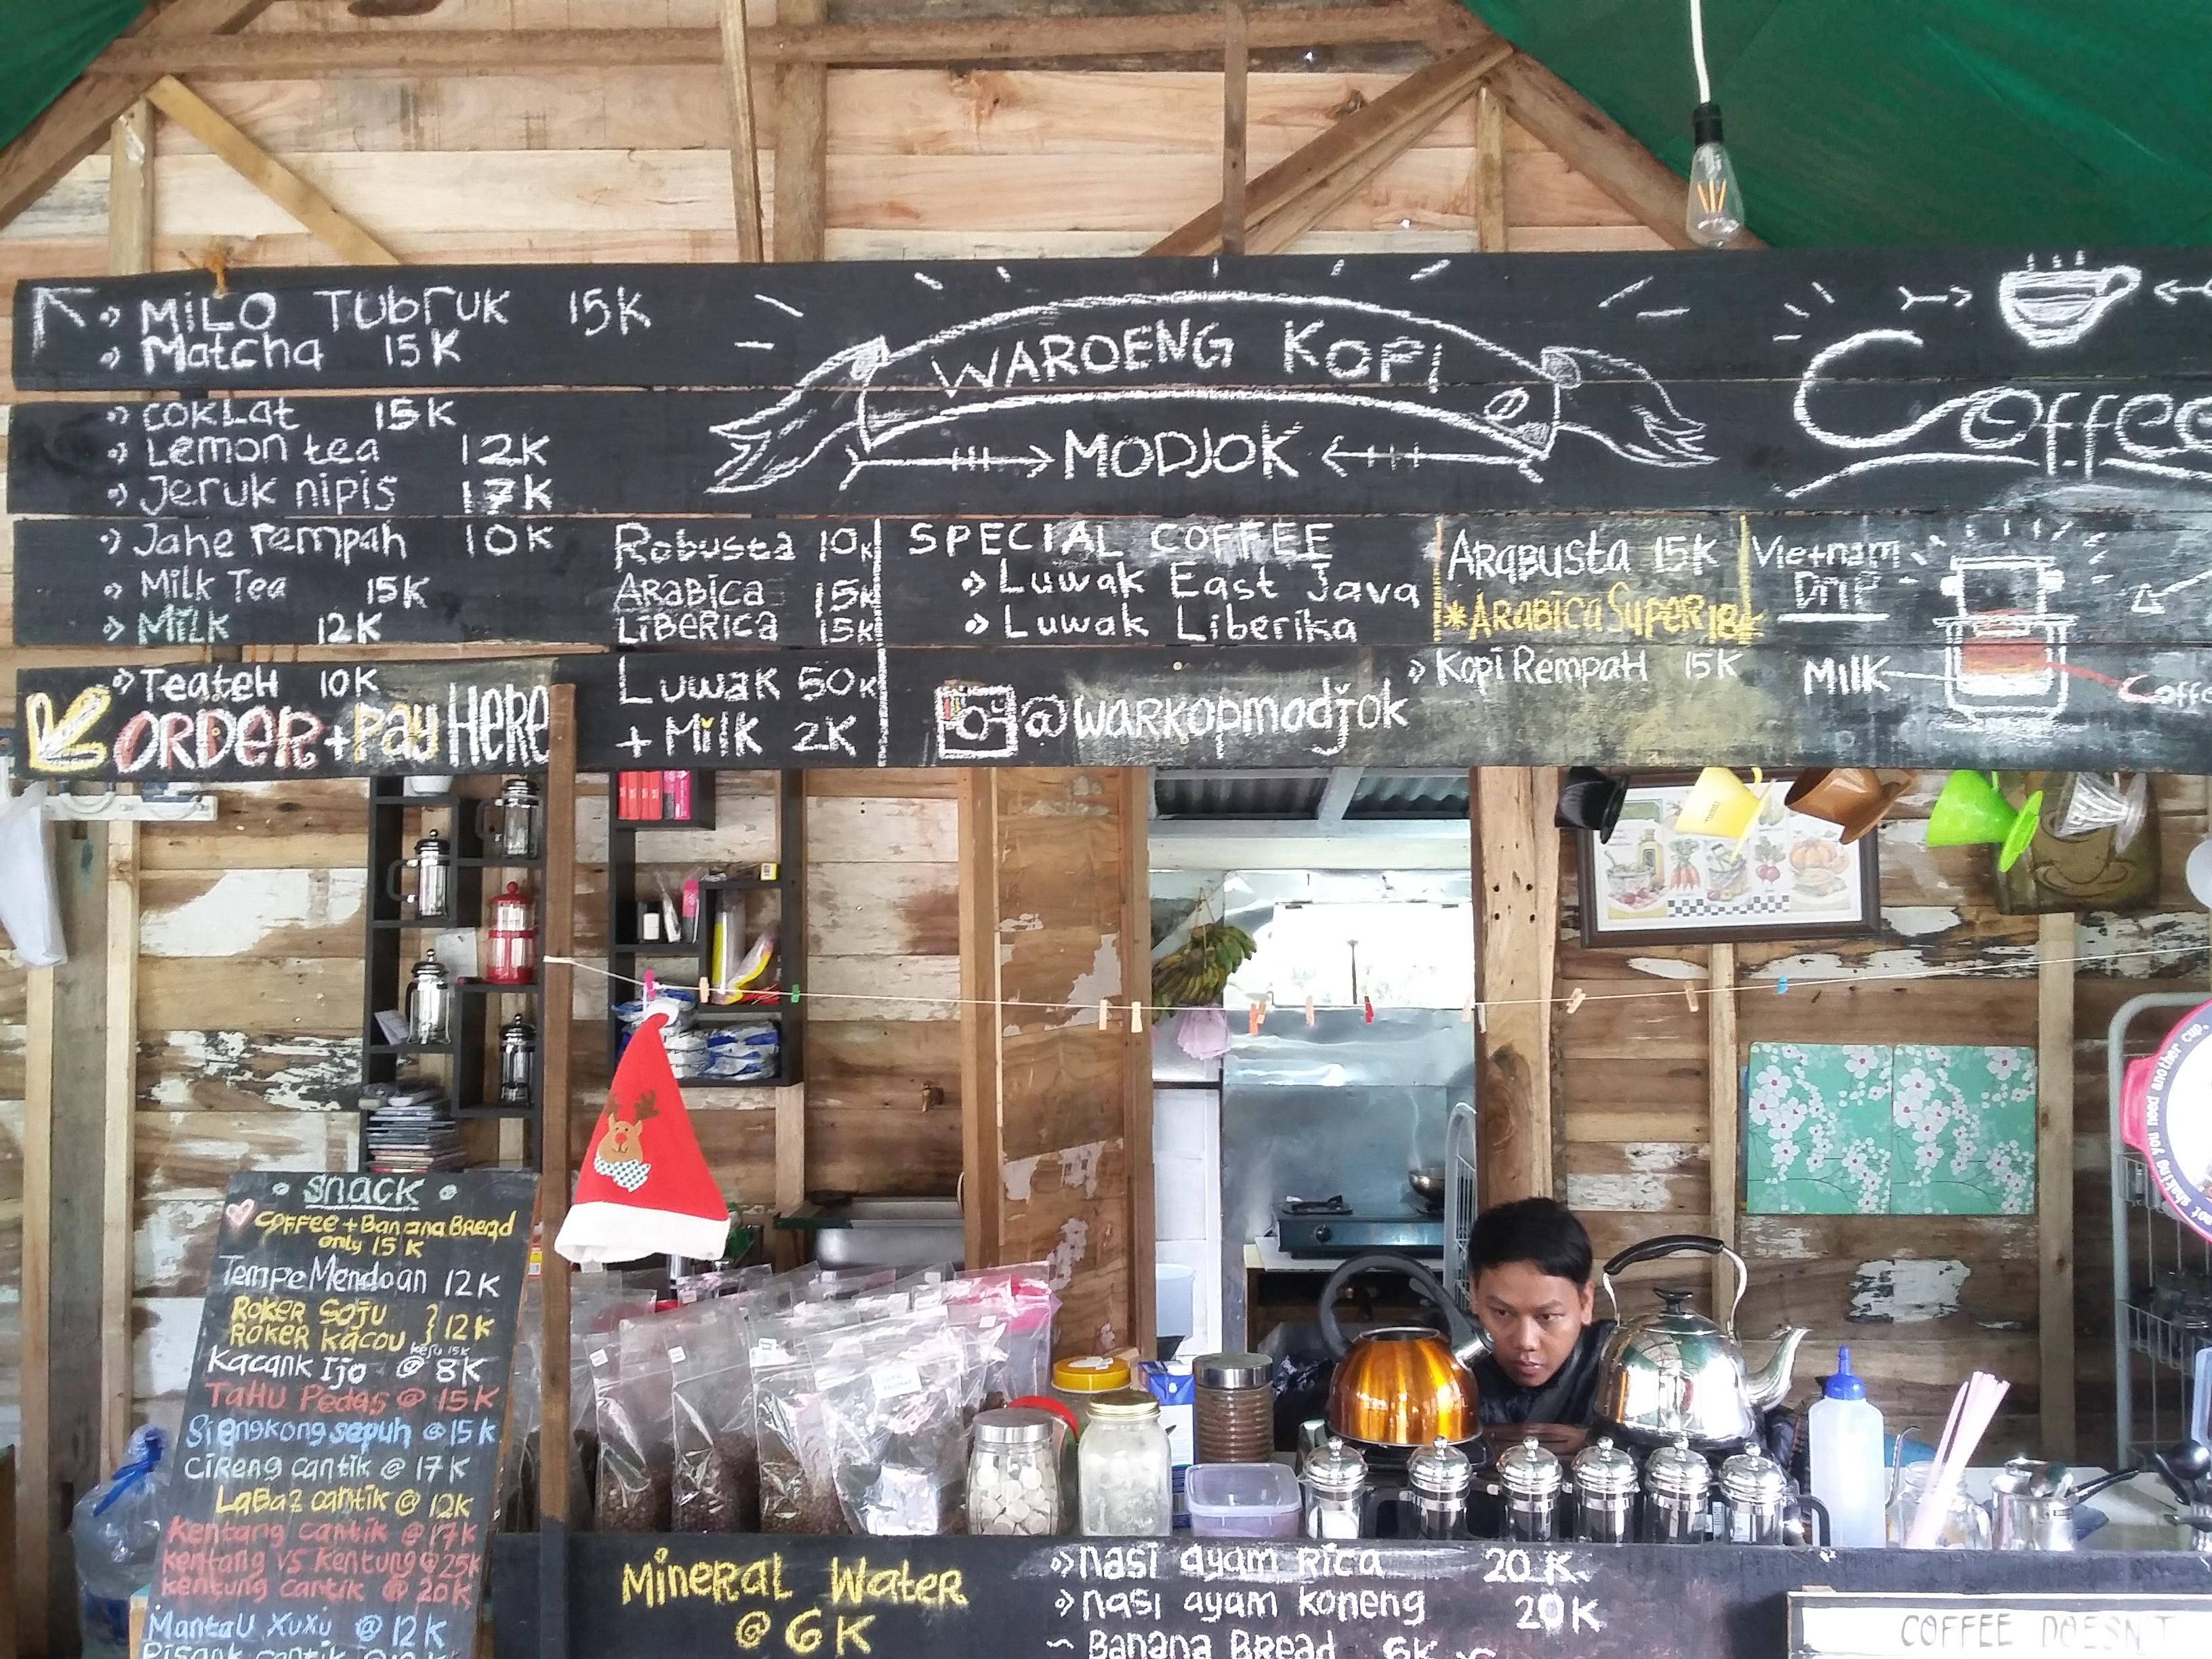 Warkop Modjok Bandung Si Caf  Kayu Unik yang Mojok